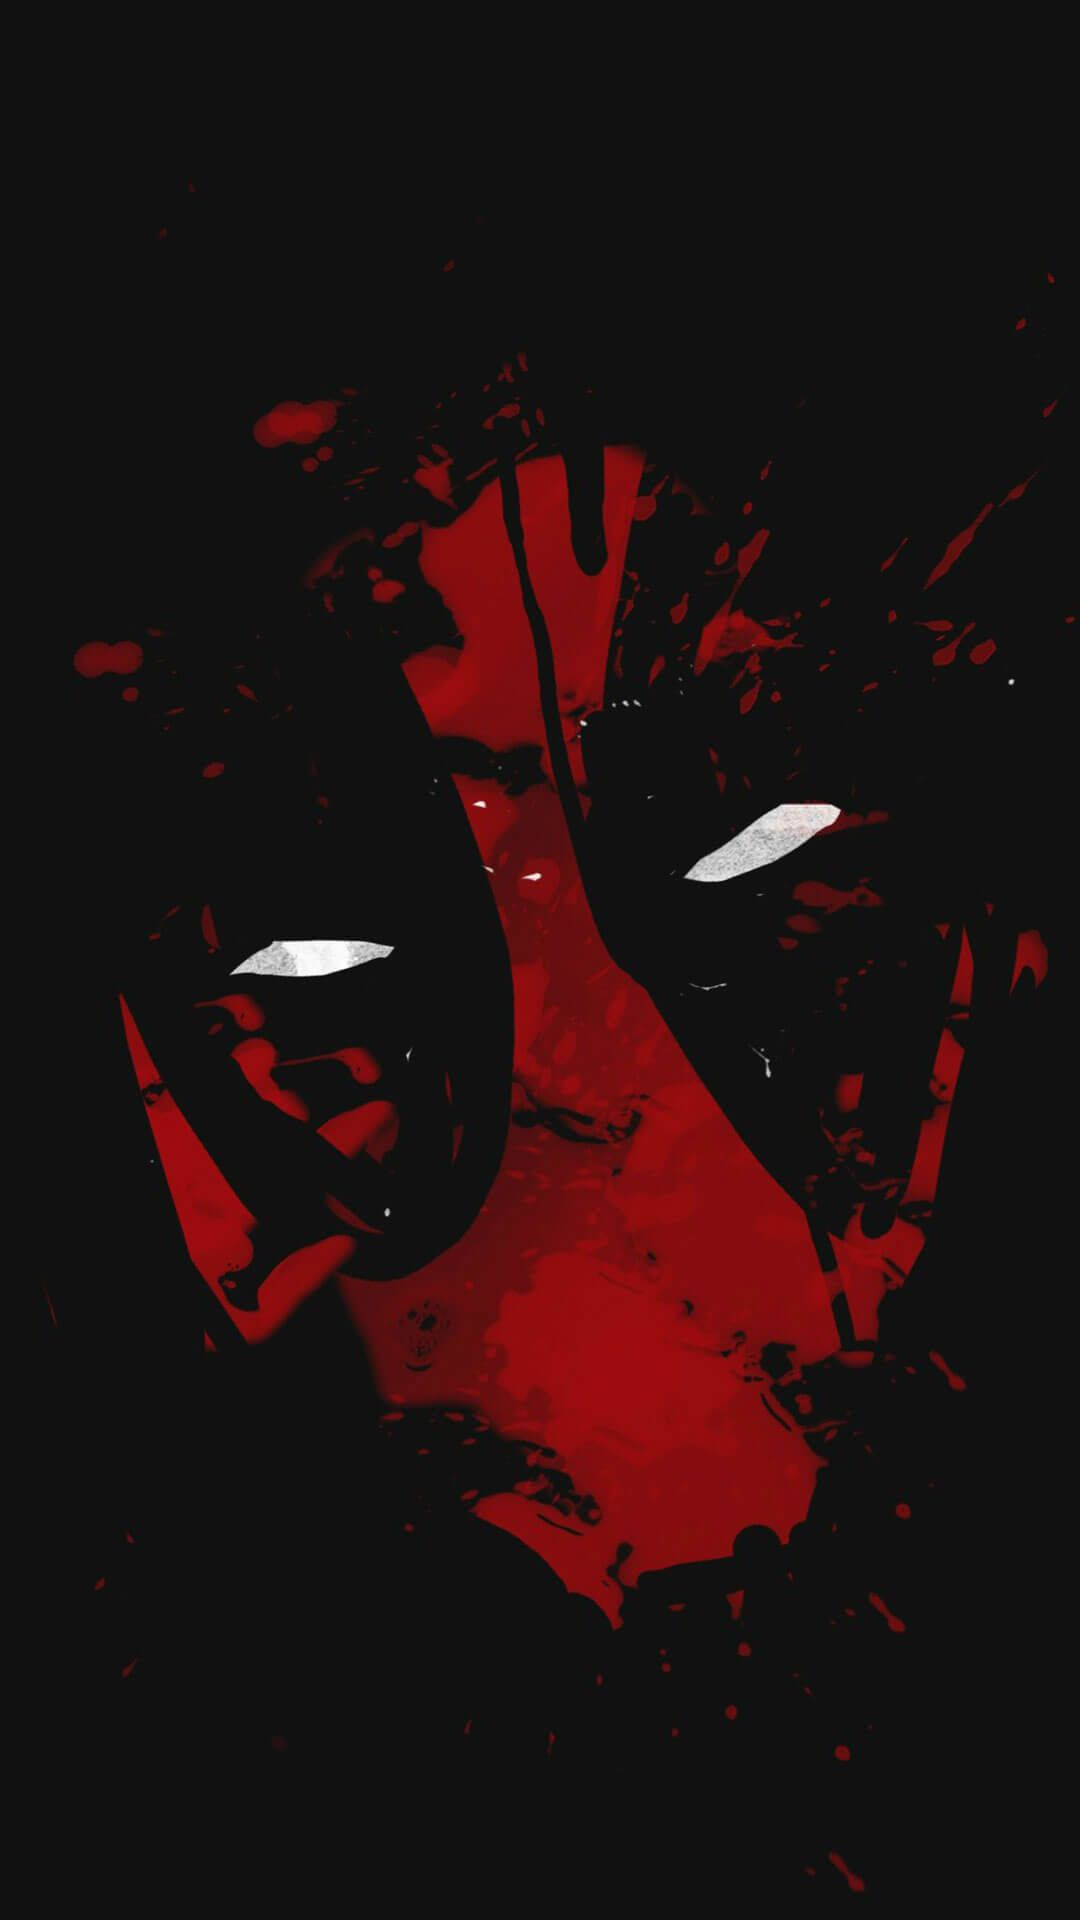 Deadpool Smartphone Wallpapers Top Free Deadpool